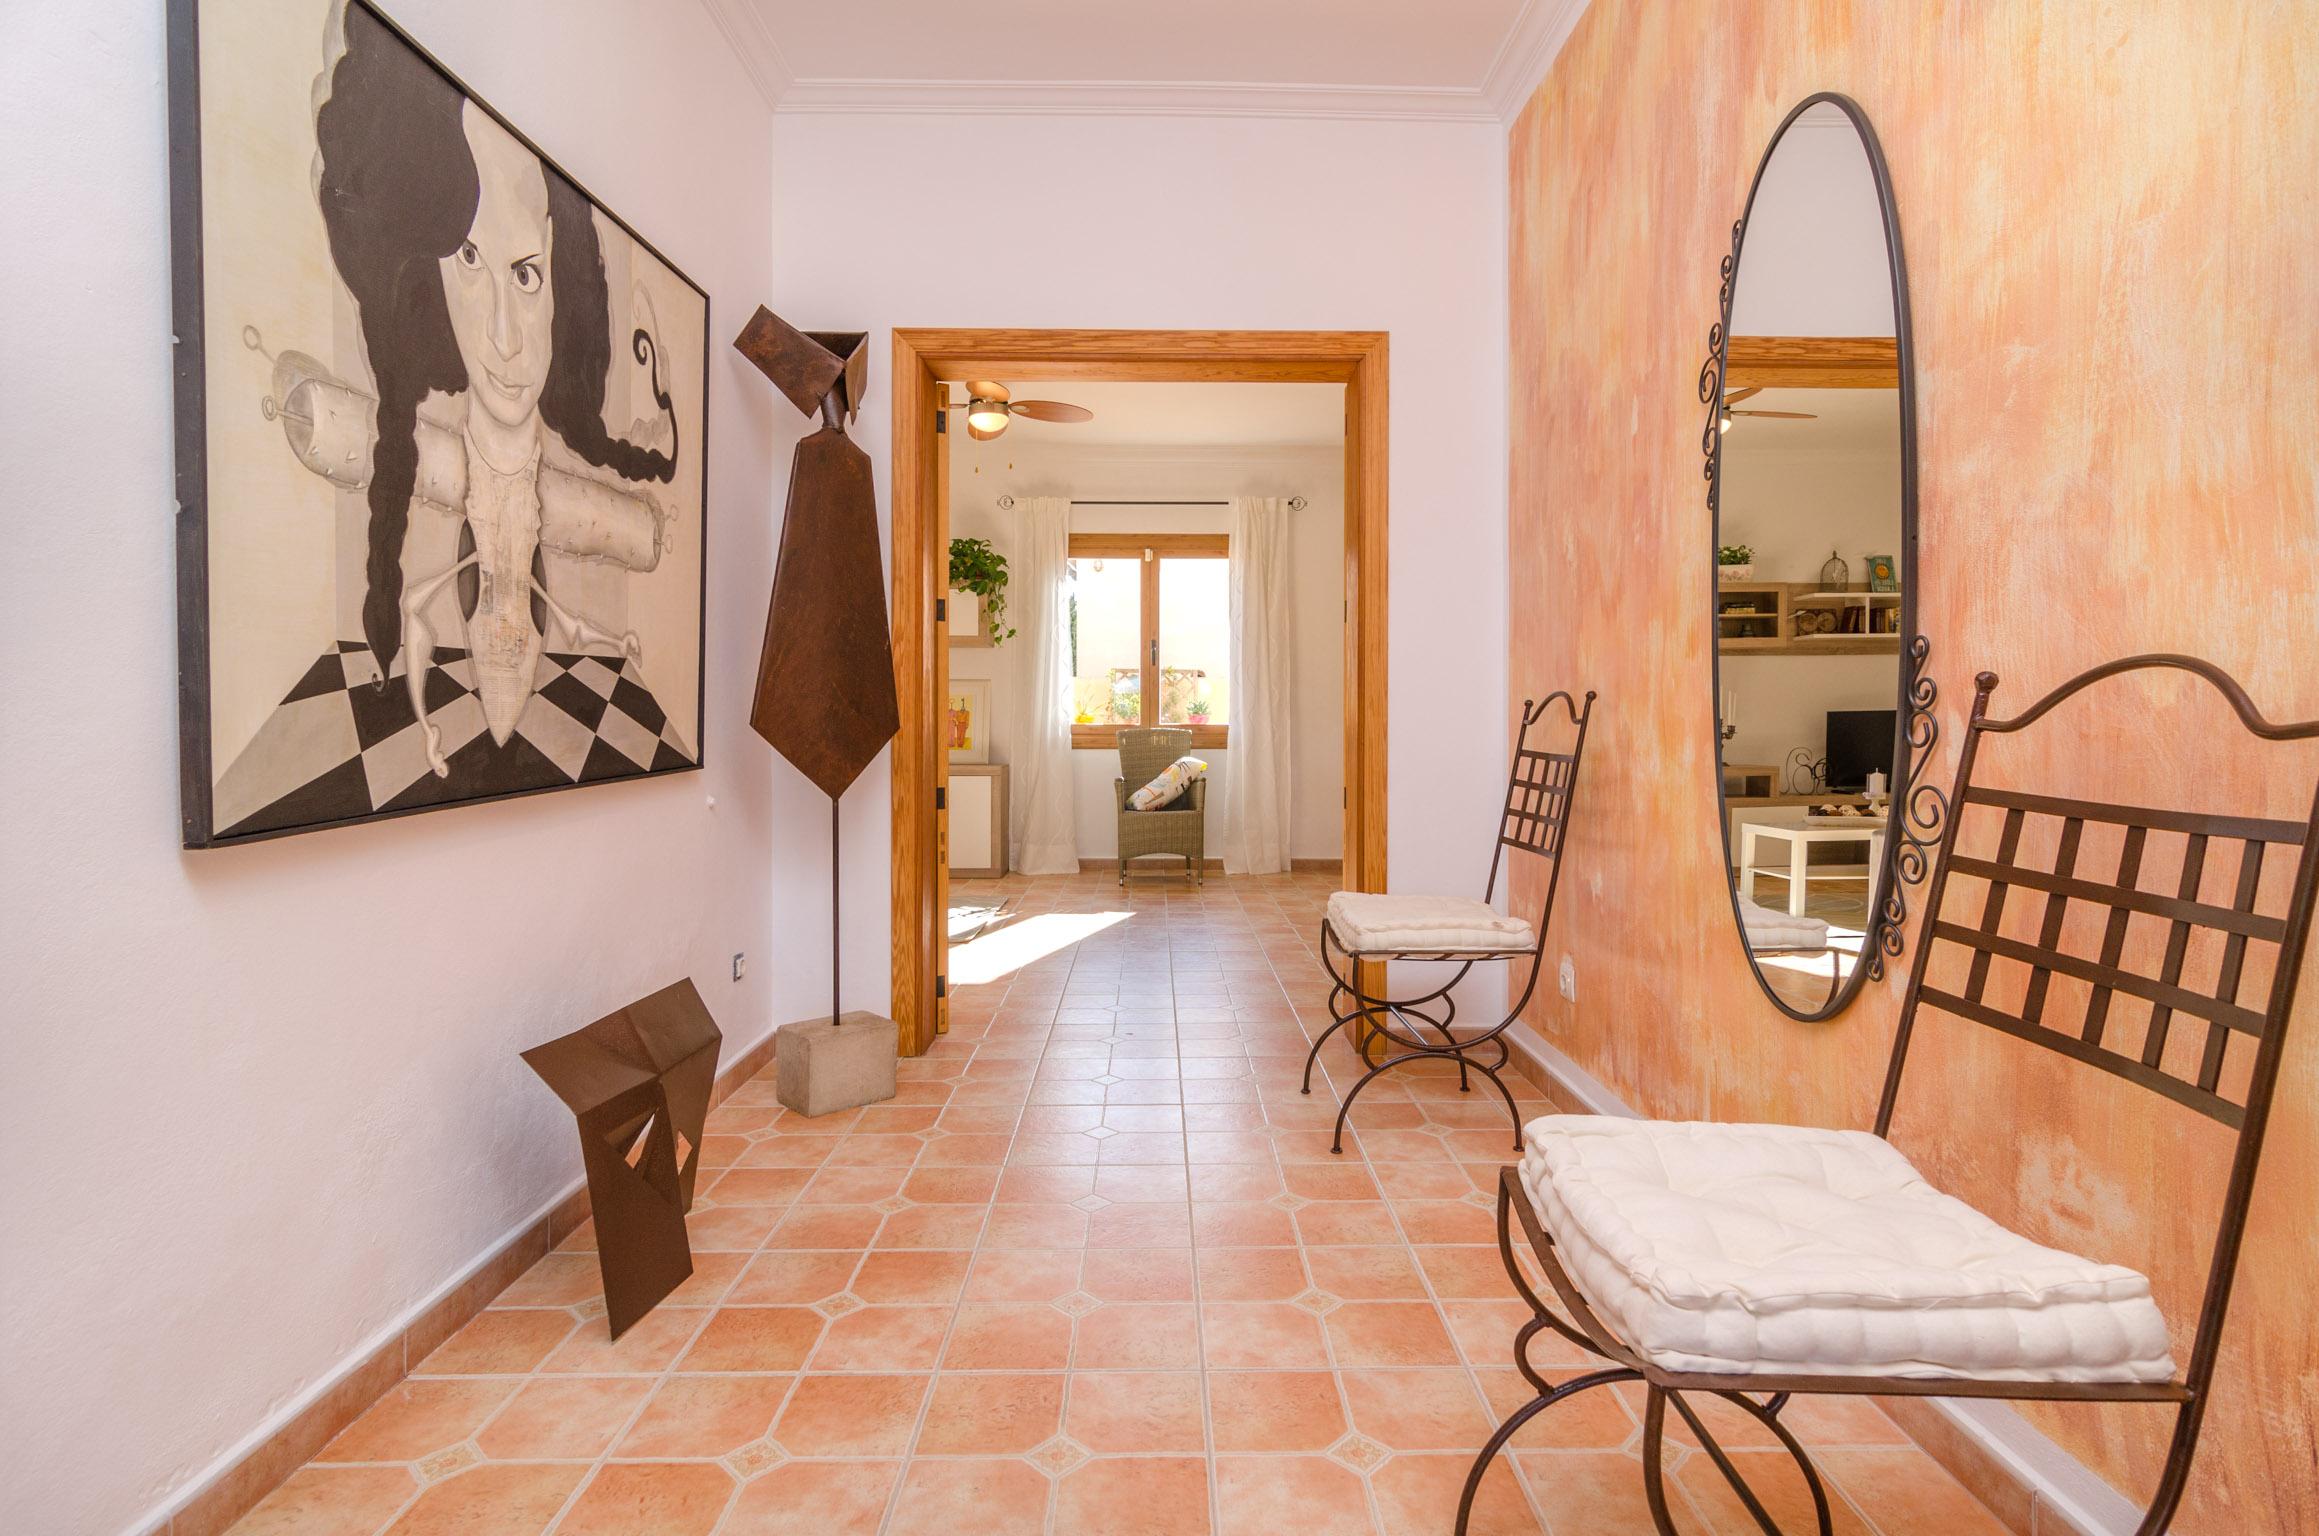 Ferienhaus SANT BLAI VELL (2284789), Campos, Mallorca, Balearische Inseln, Spanien, Bild 11